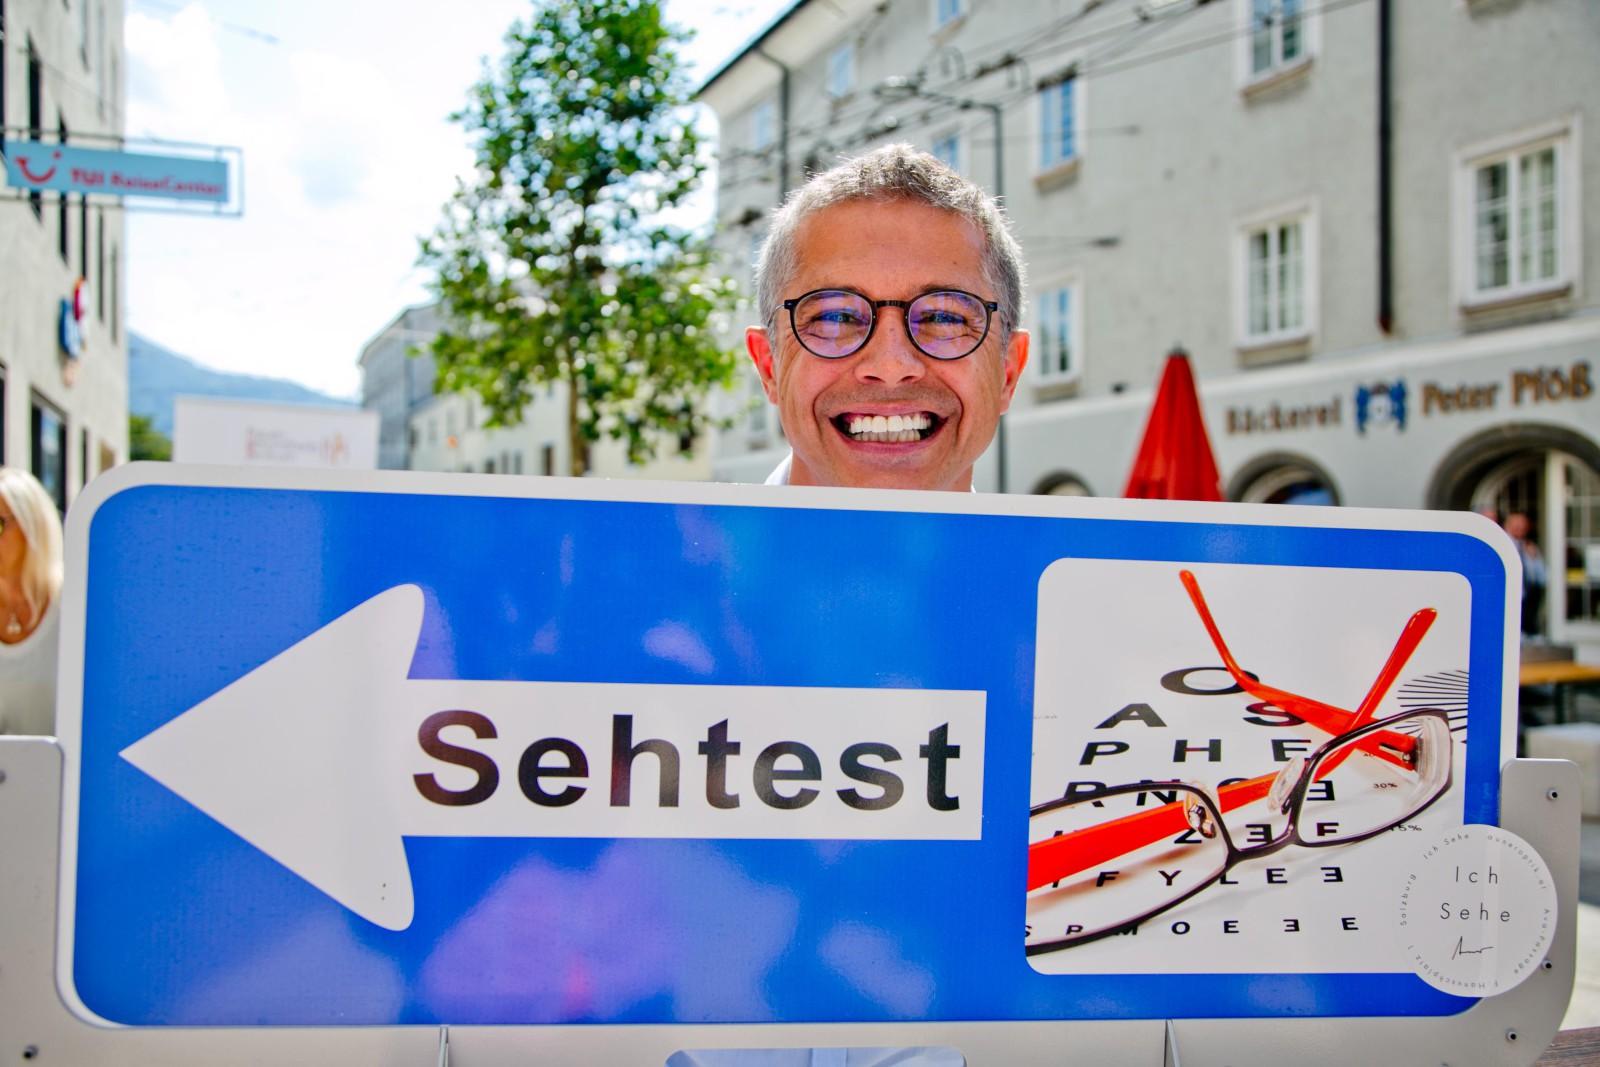 Berhard Auner, Optiker, Griesgasseneröffnung, Grieeeesig, Flaniermeile, Altstadt, Salzburg,  (c) wildbild